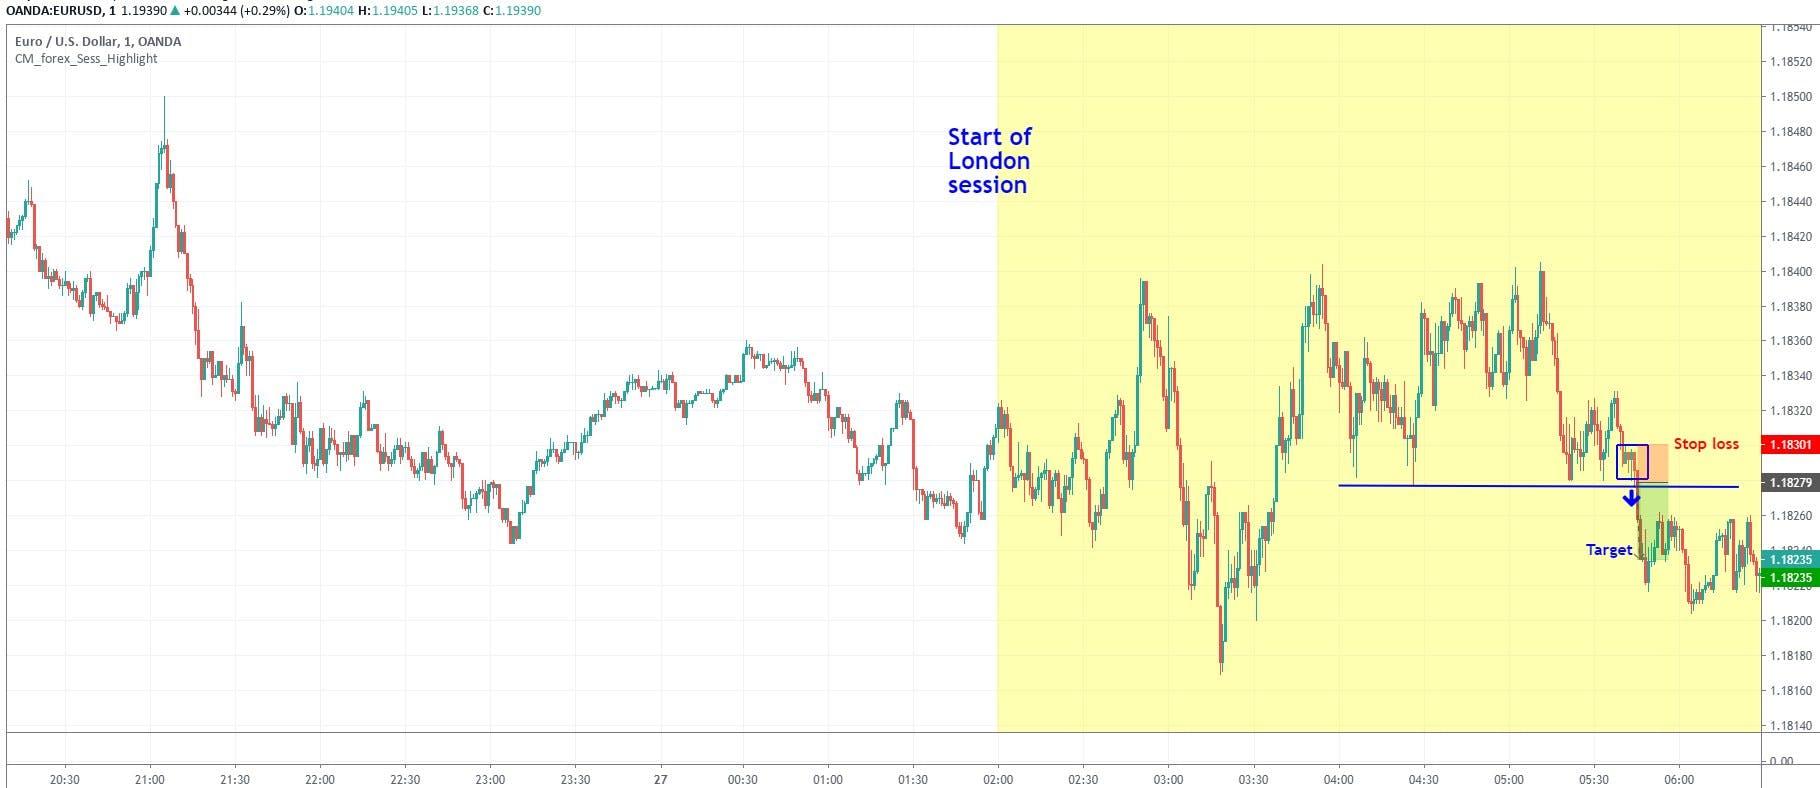 EURUSD technical turnaround EURUSD day trading strategy on 1-minute chart